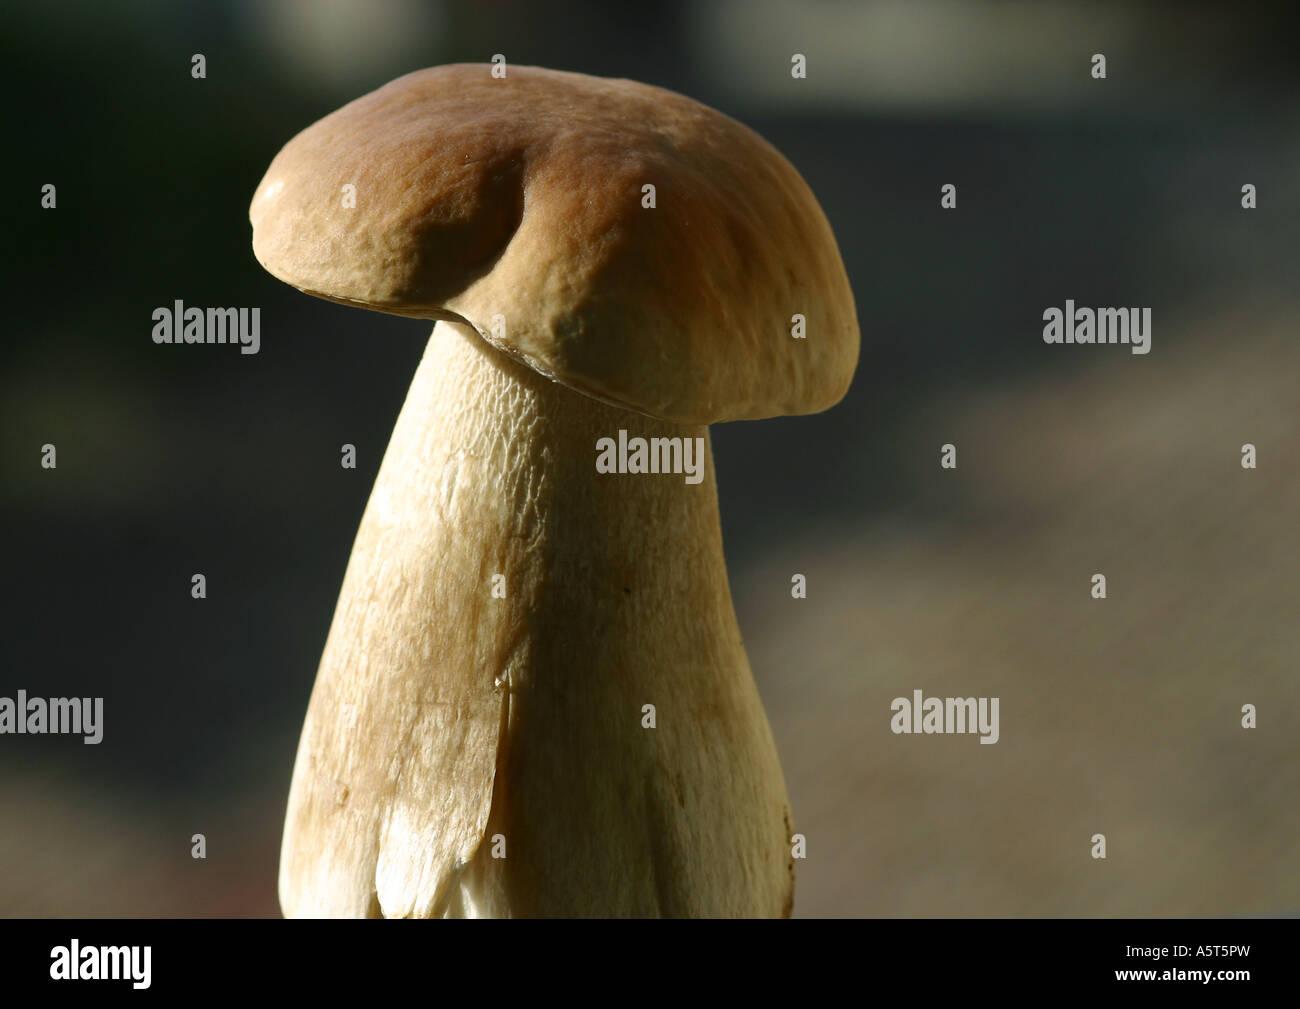 Boletus mushroom - Stock Image